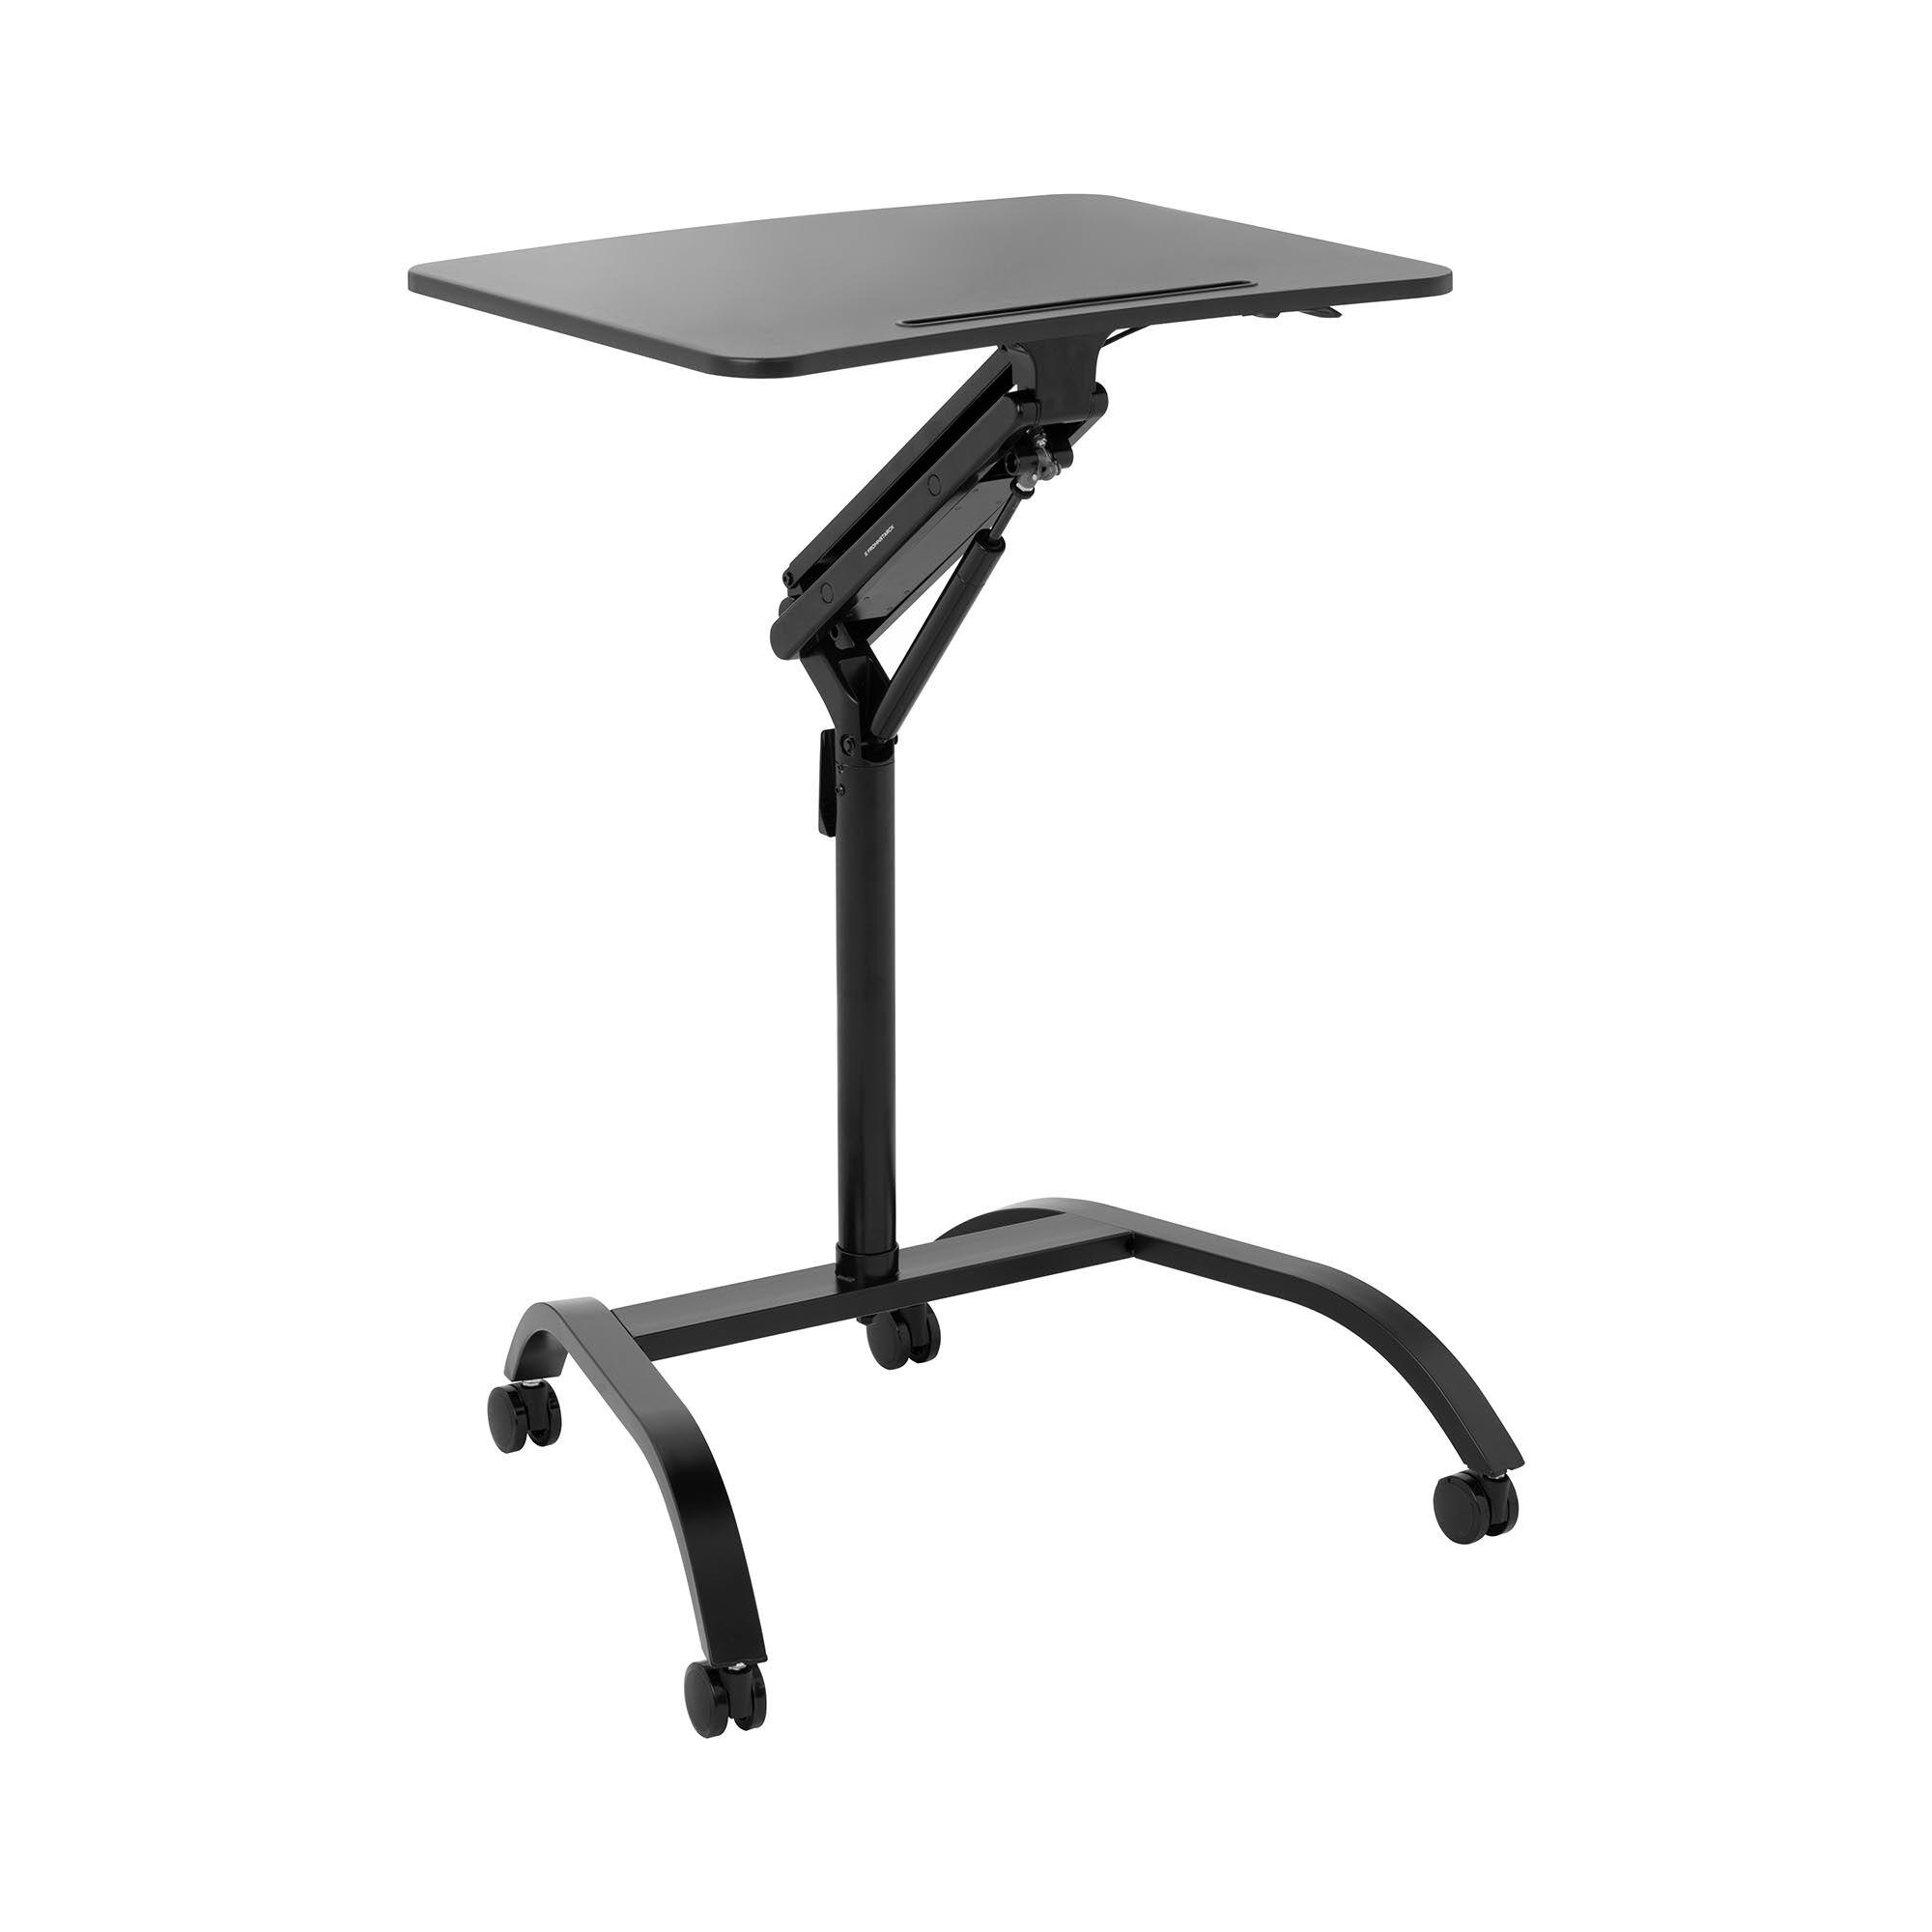 Fromm & Starck Justerbart laptopbord - 89,5 cm x 54 cm